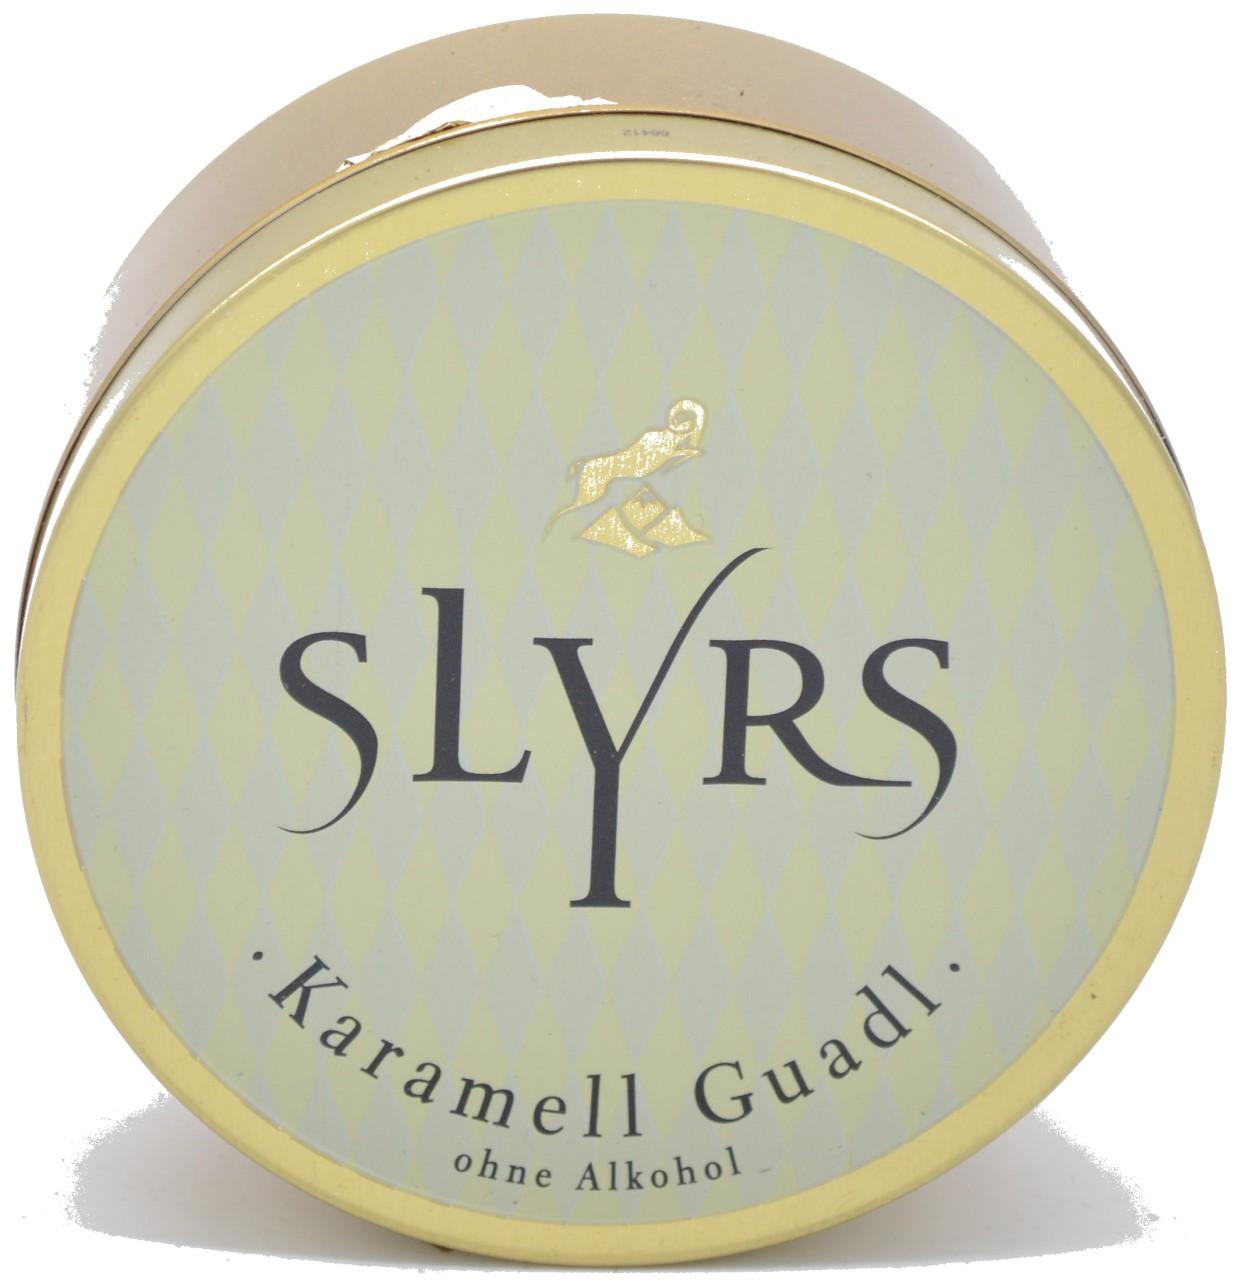 Slyrs Karamell Guadl - ohne Alkohol